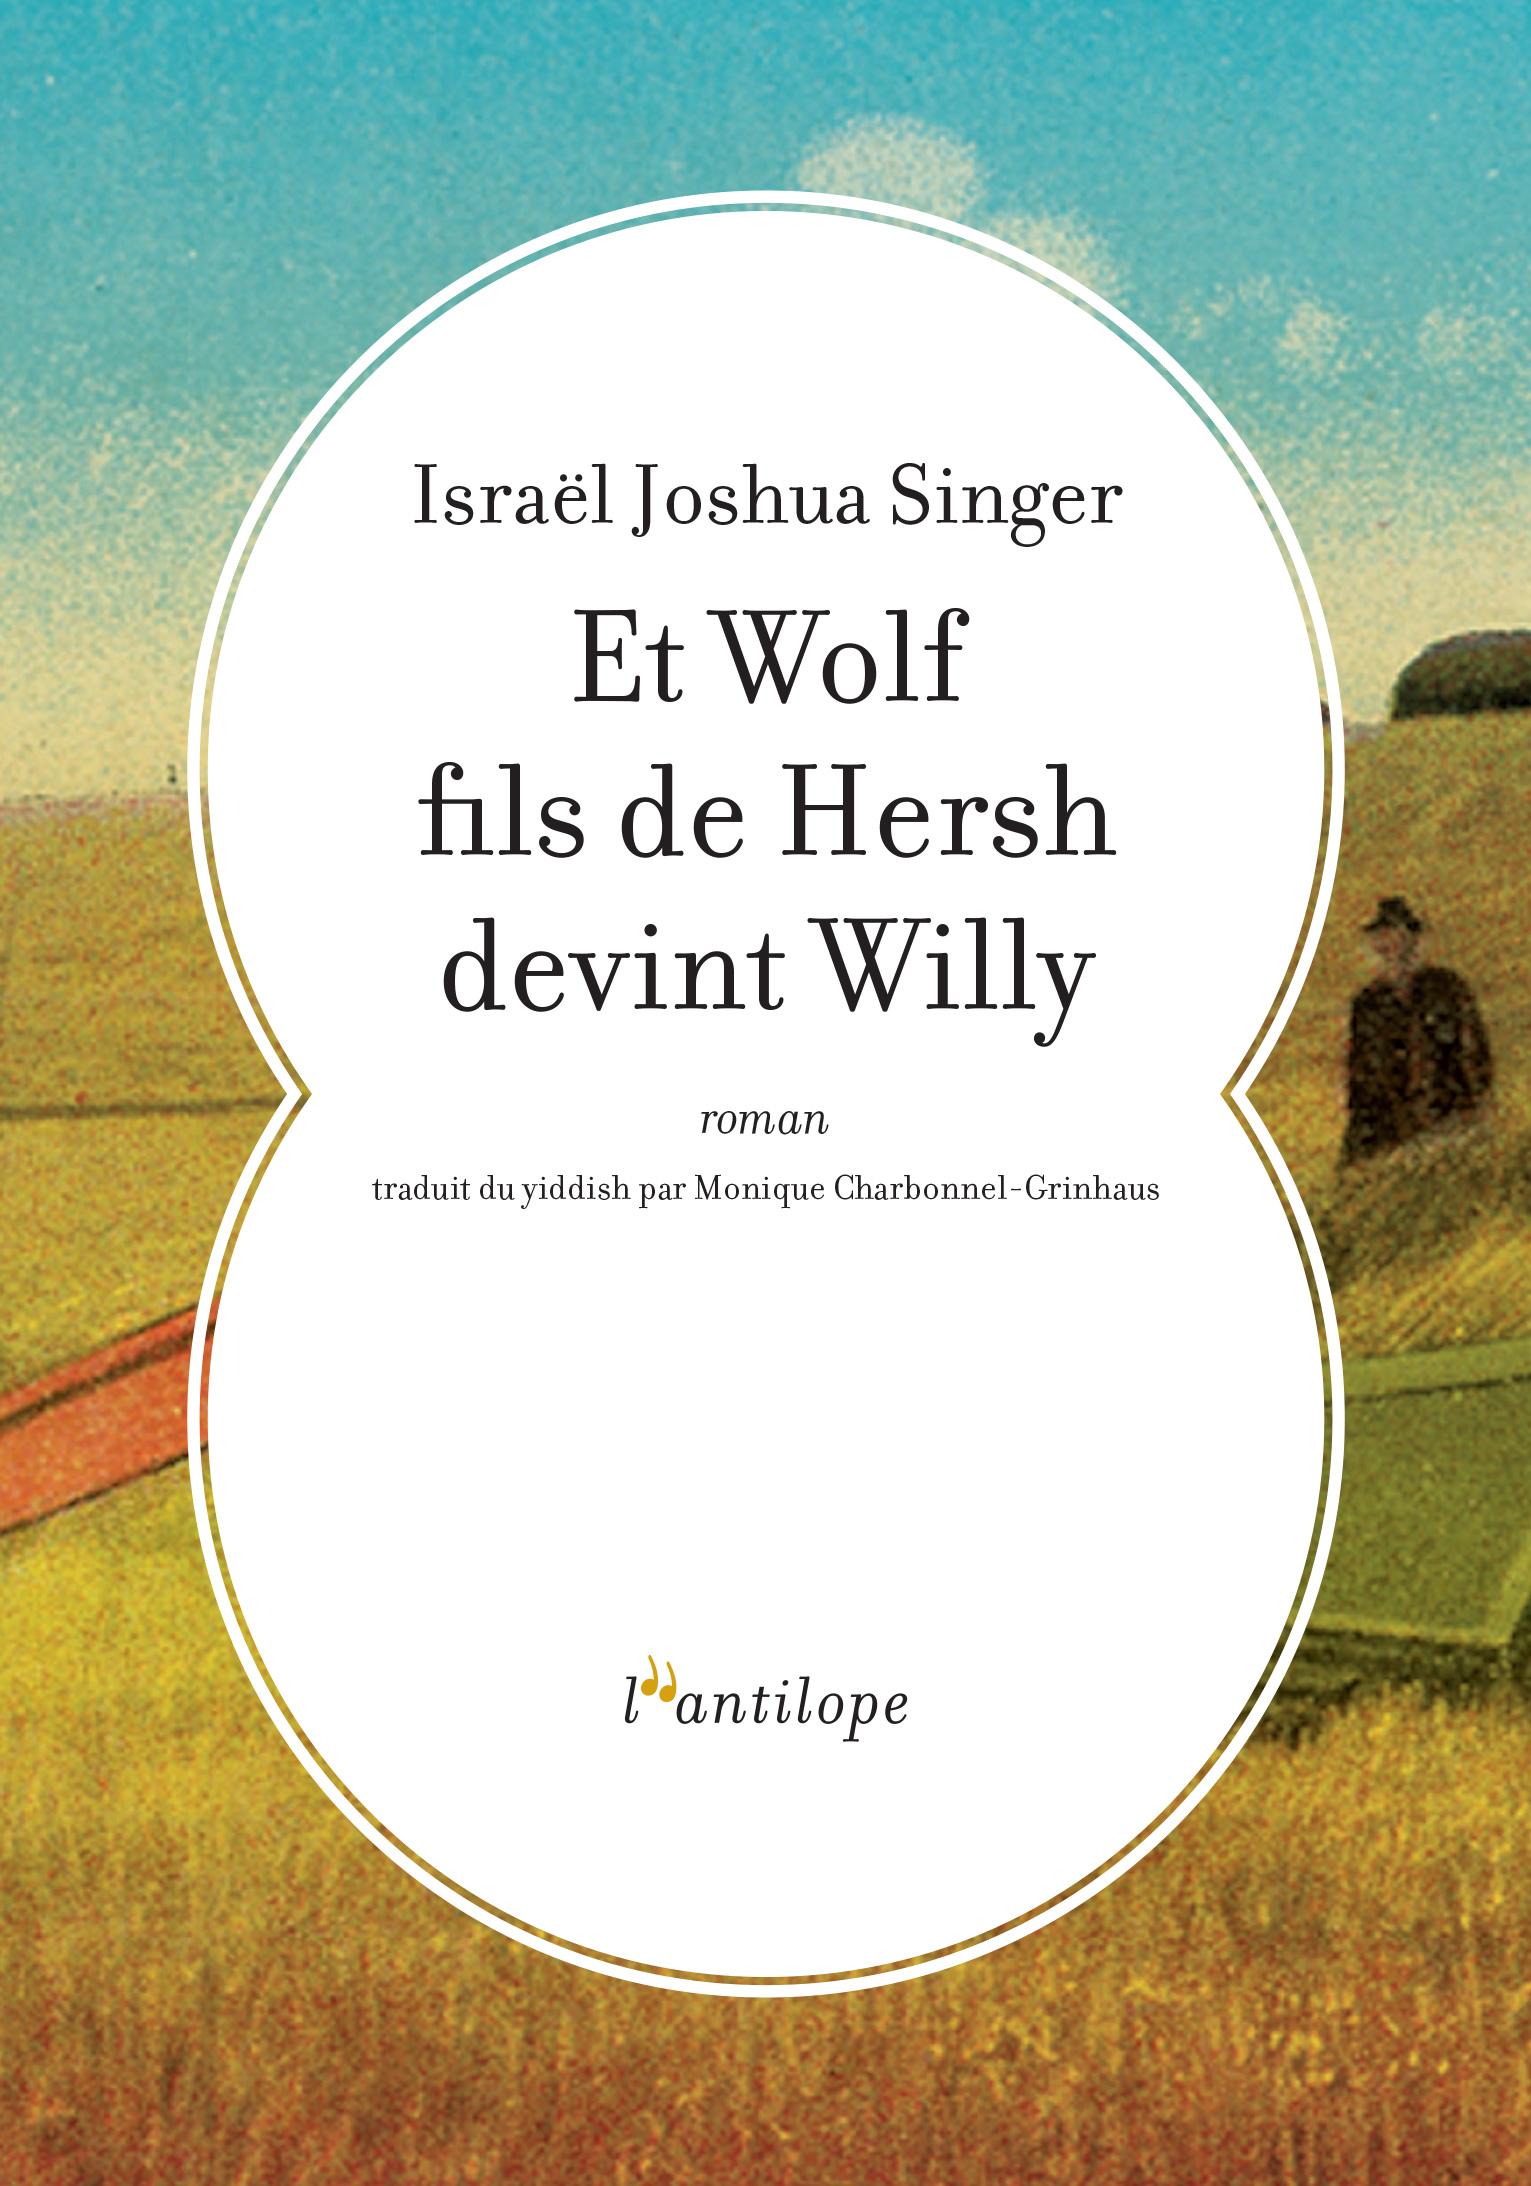 ET WOLF FILS DE HERSH DEVINT WILLY